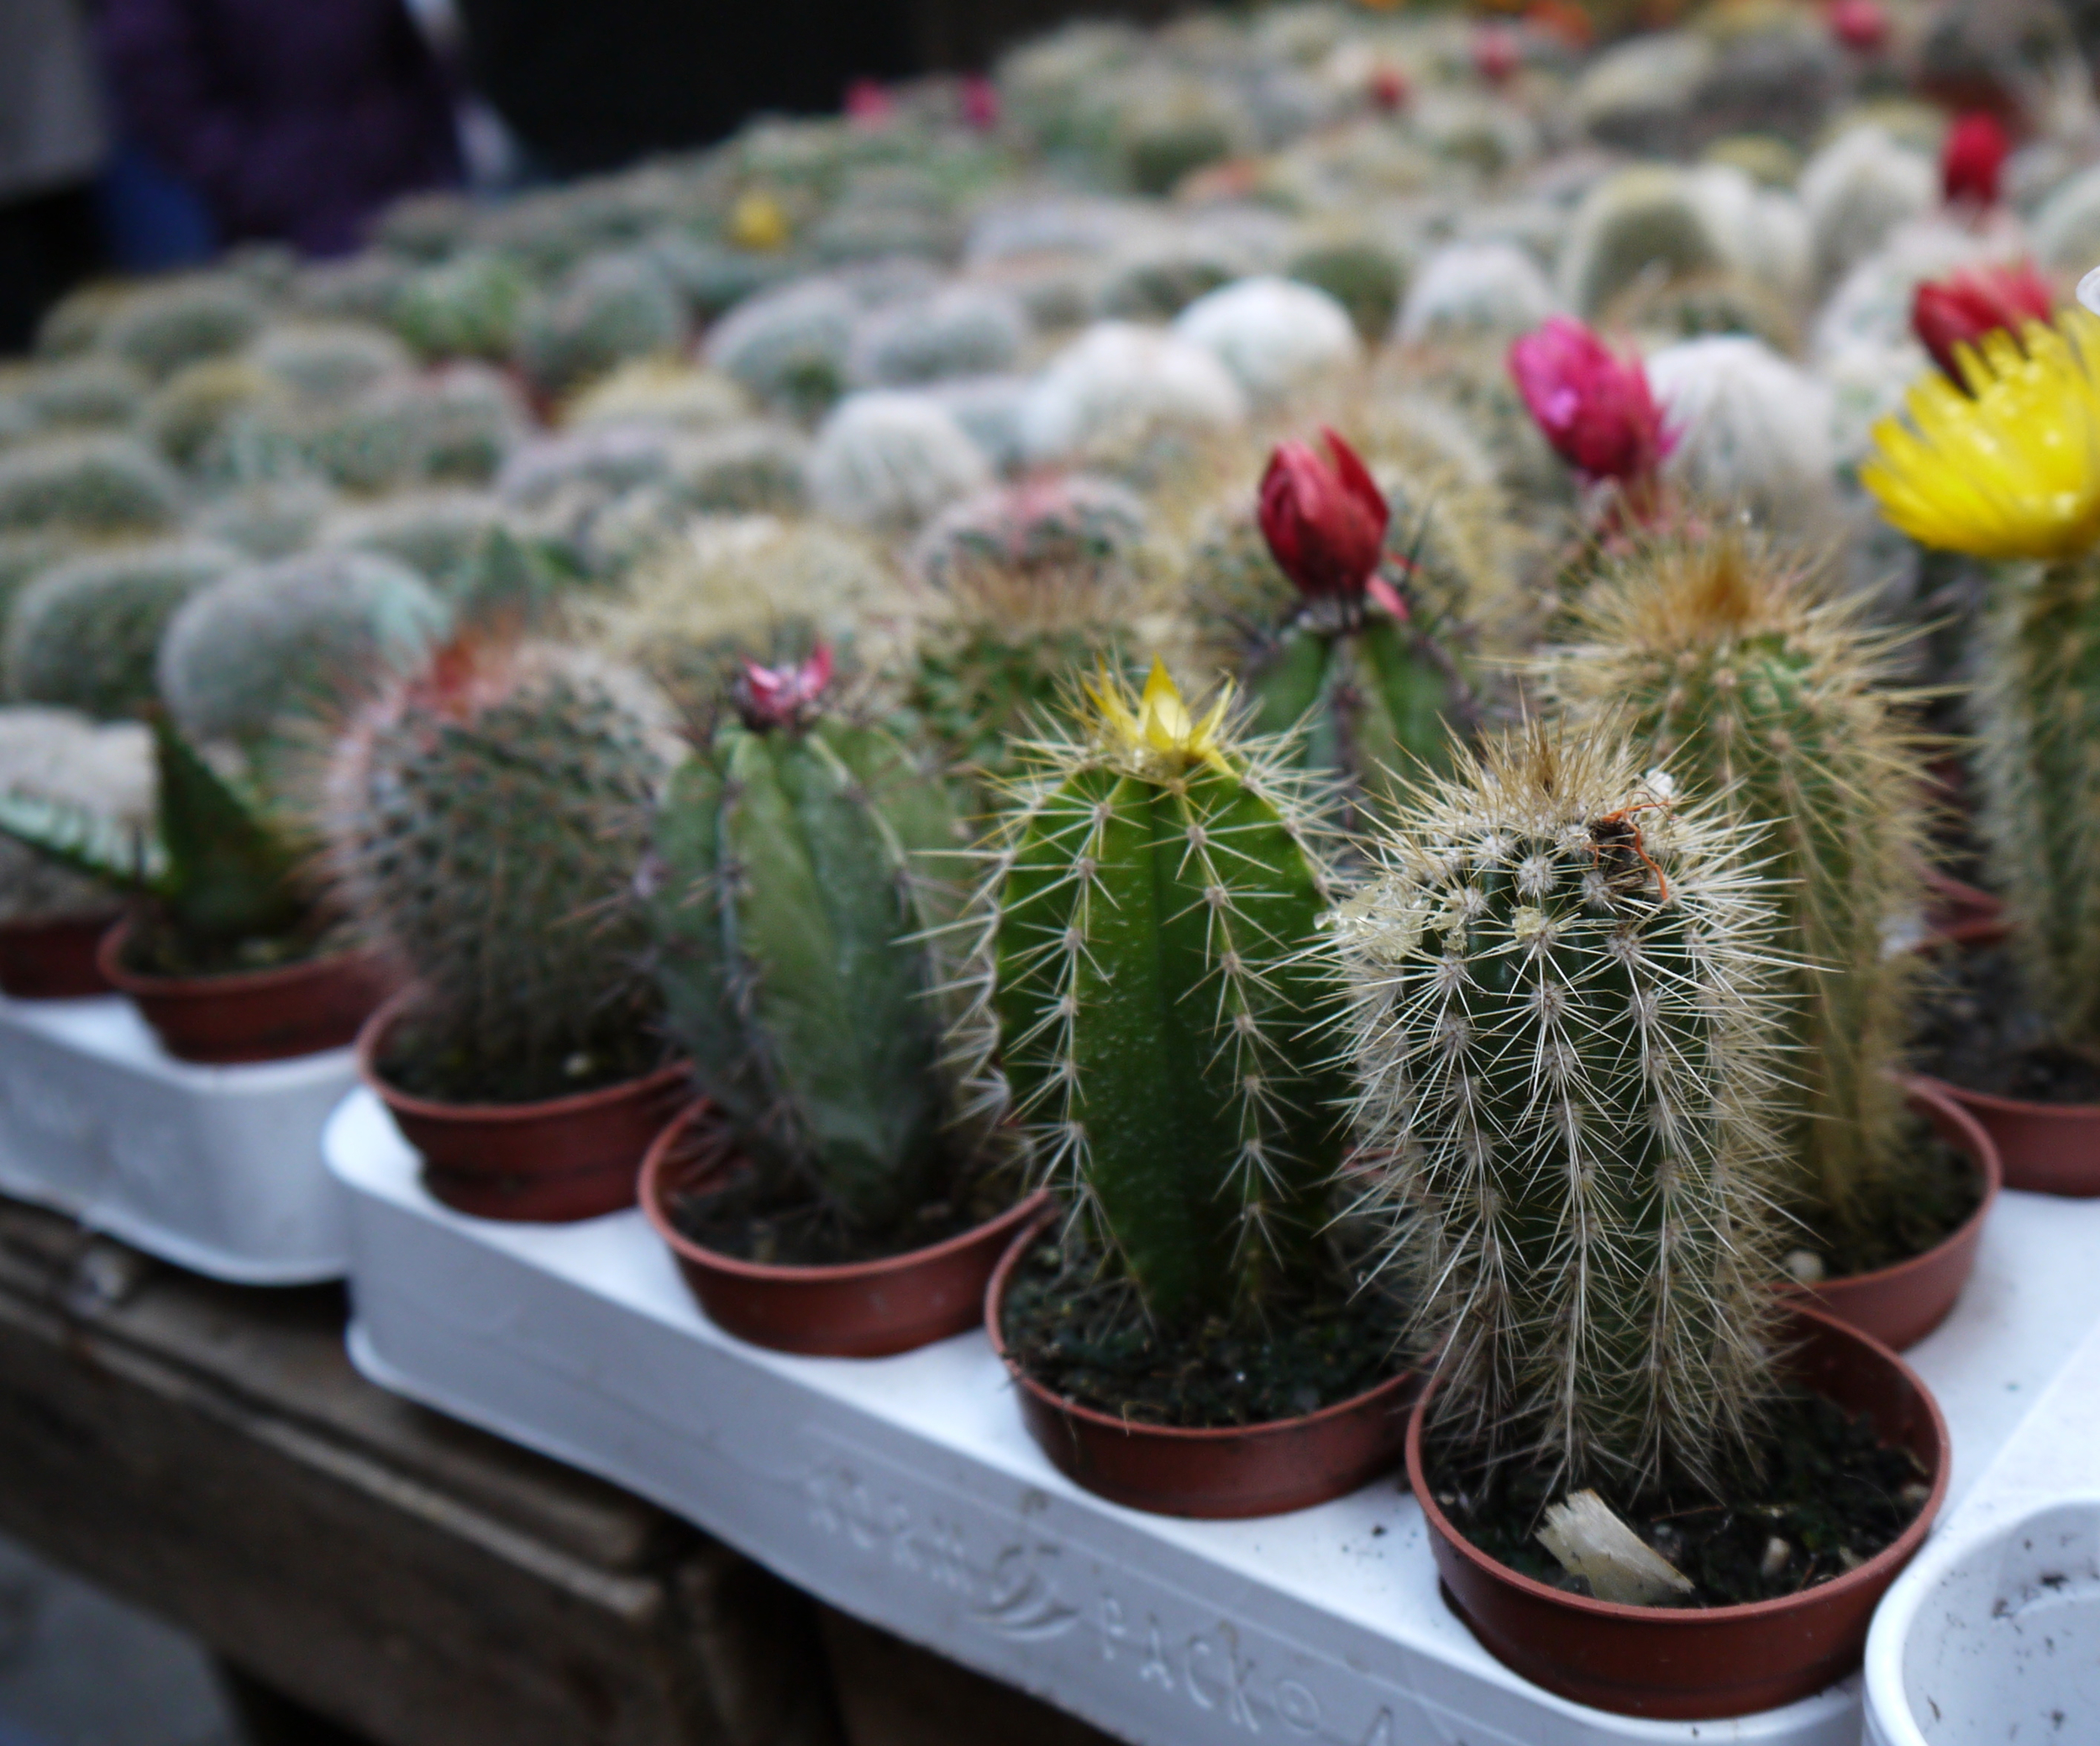 Figure 9. Cacti